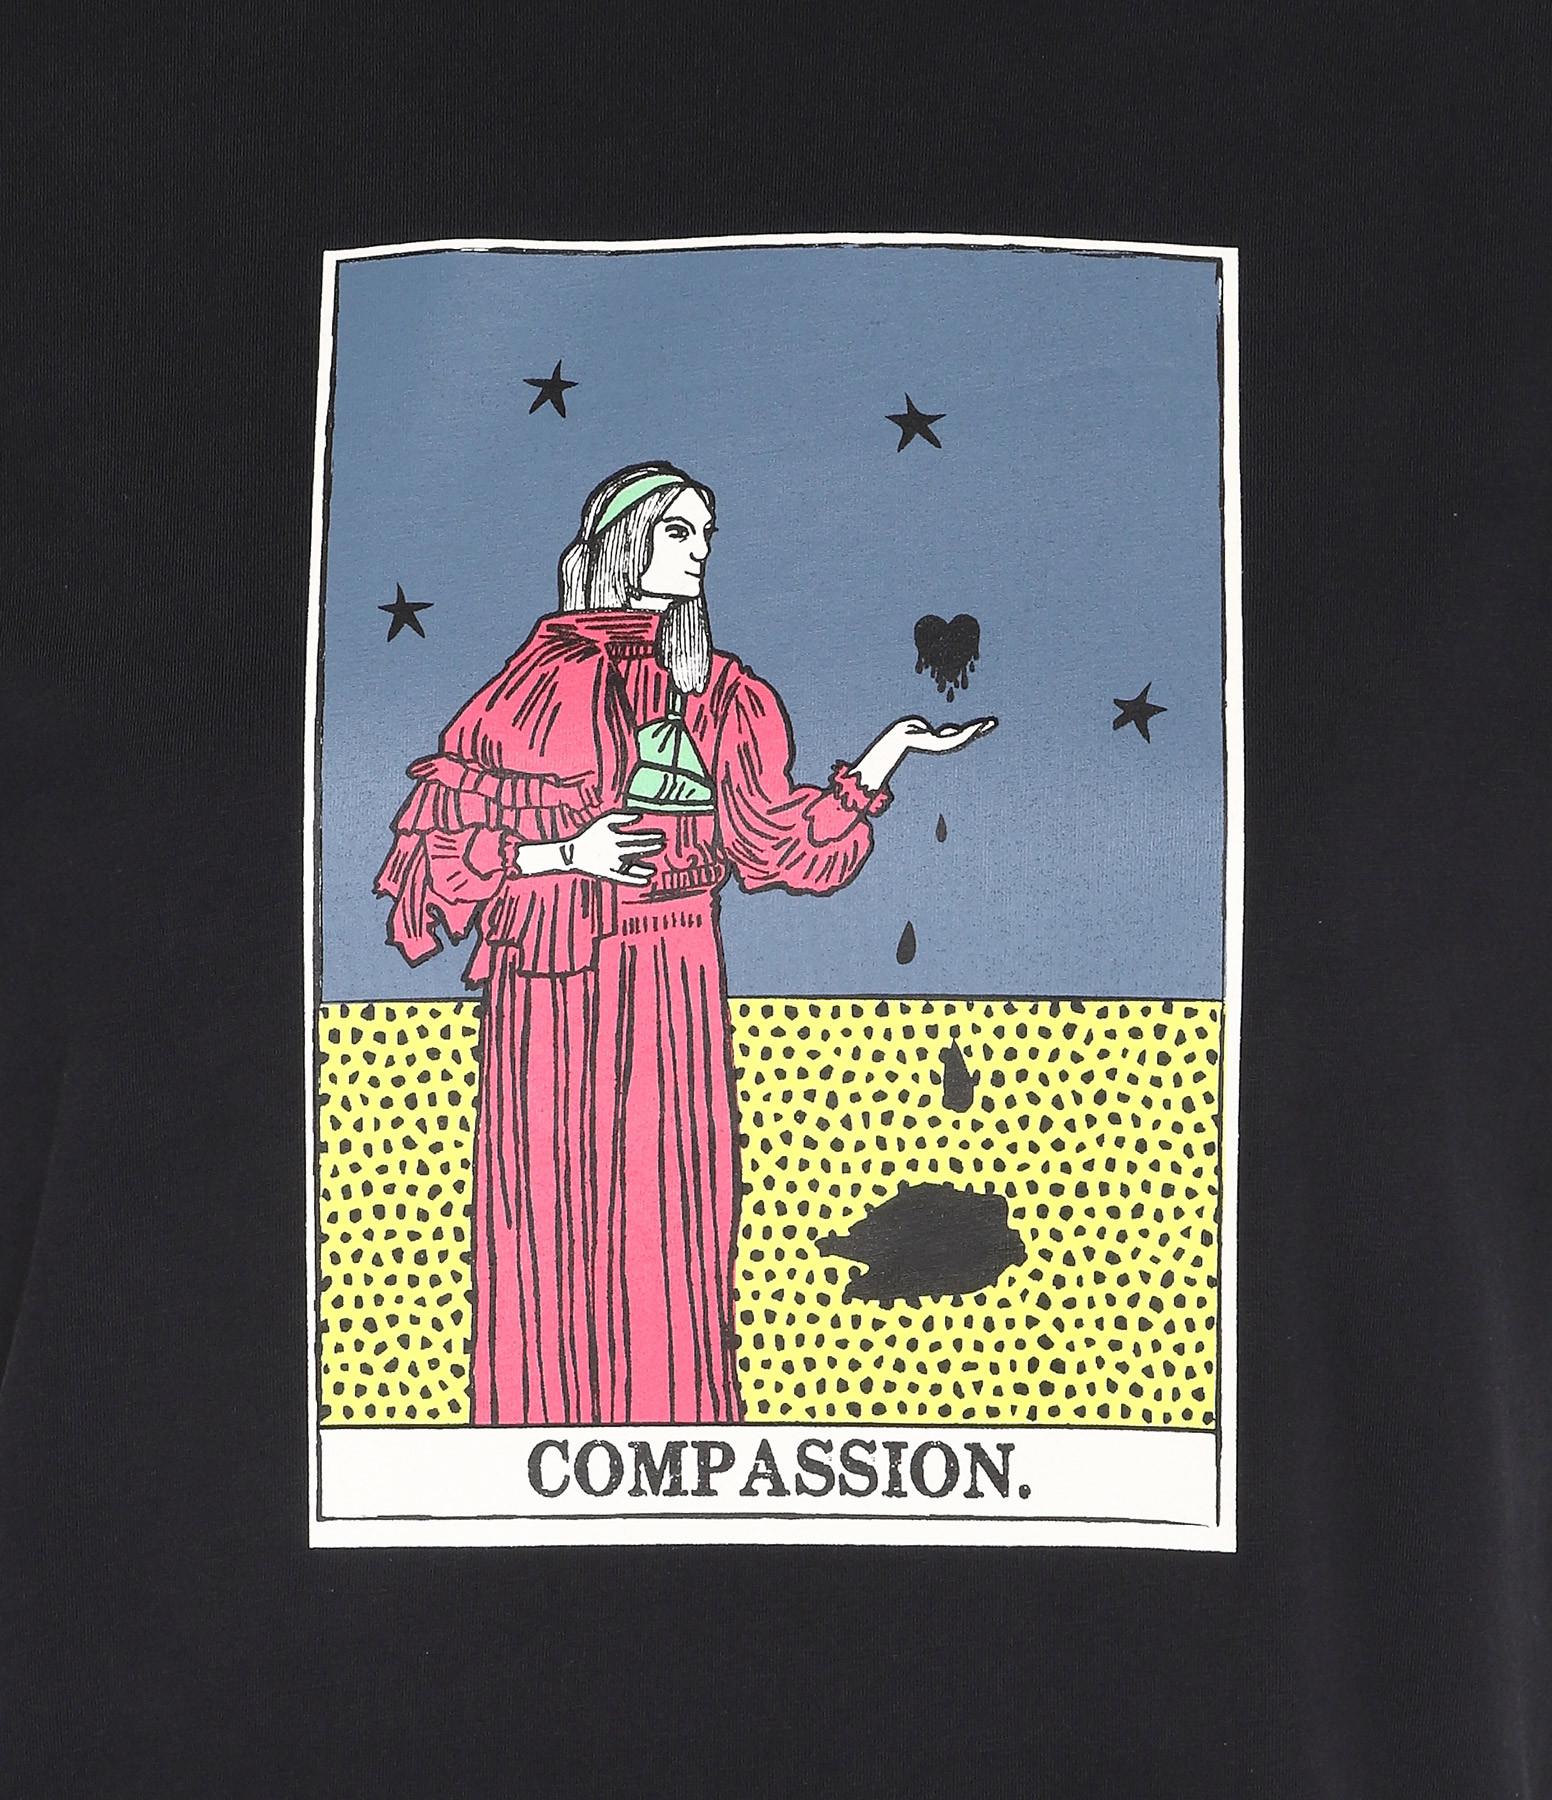 ALEXA CHUNG - Tee-shirt Compassion Coton Noir